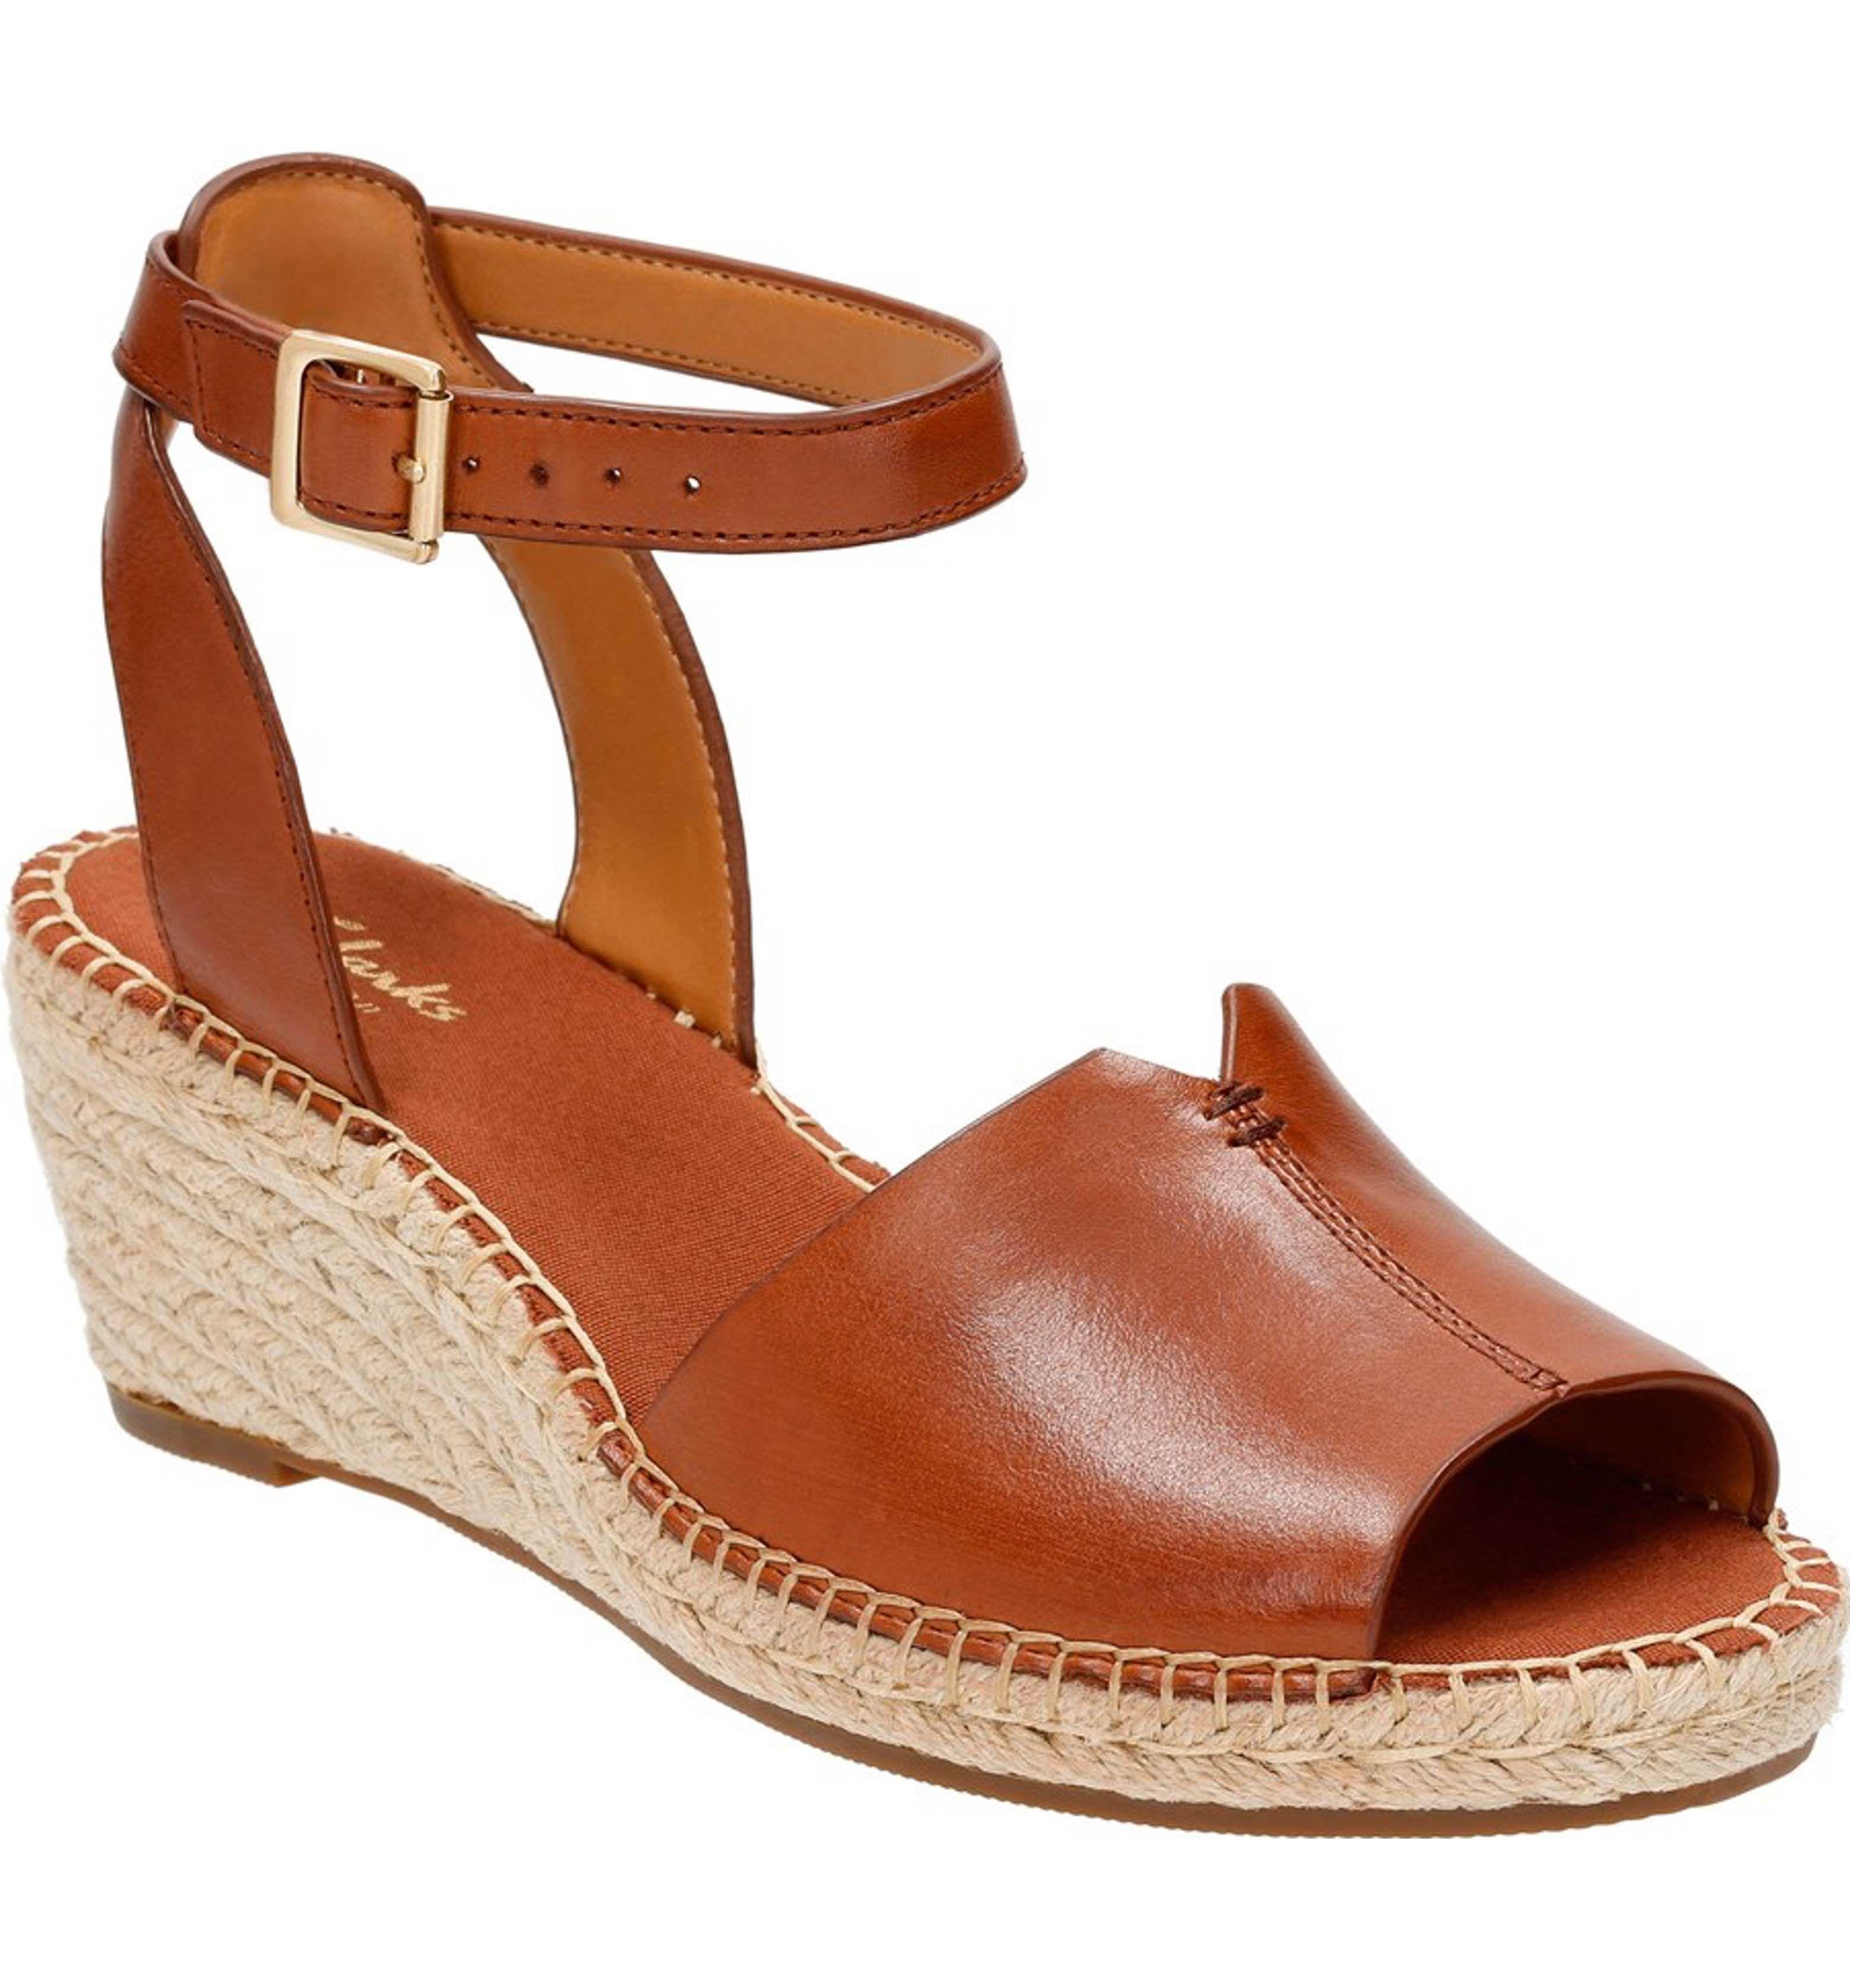 women home comfort womens comforter leather castle product comfortable wedge sandals planet fashion shoes heel dsc